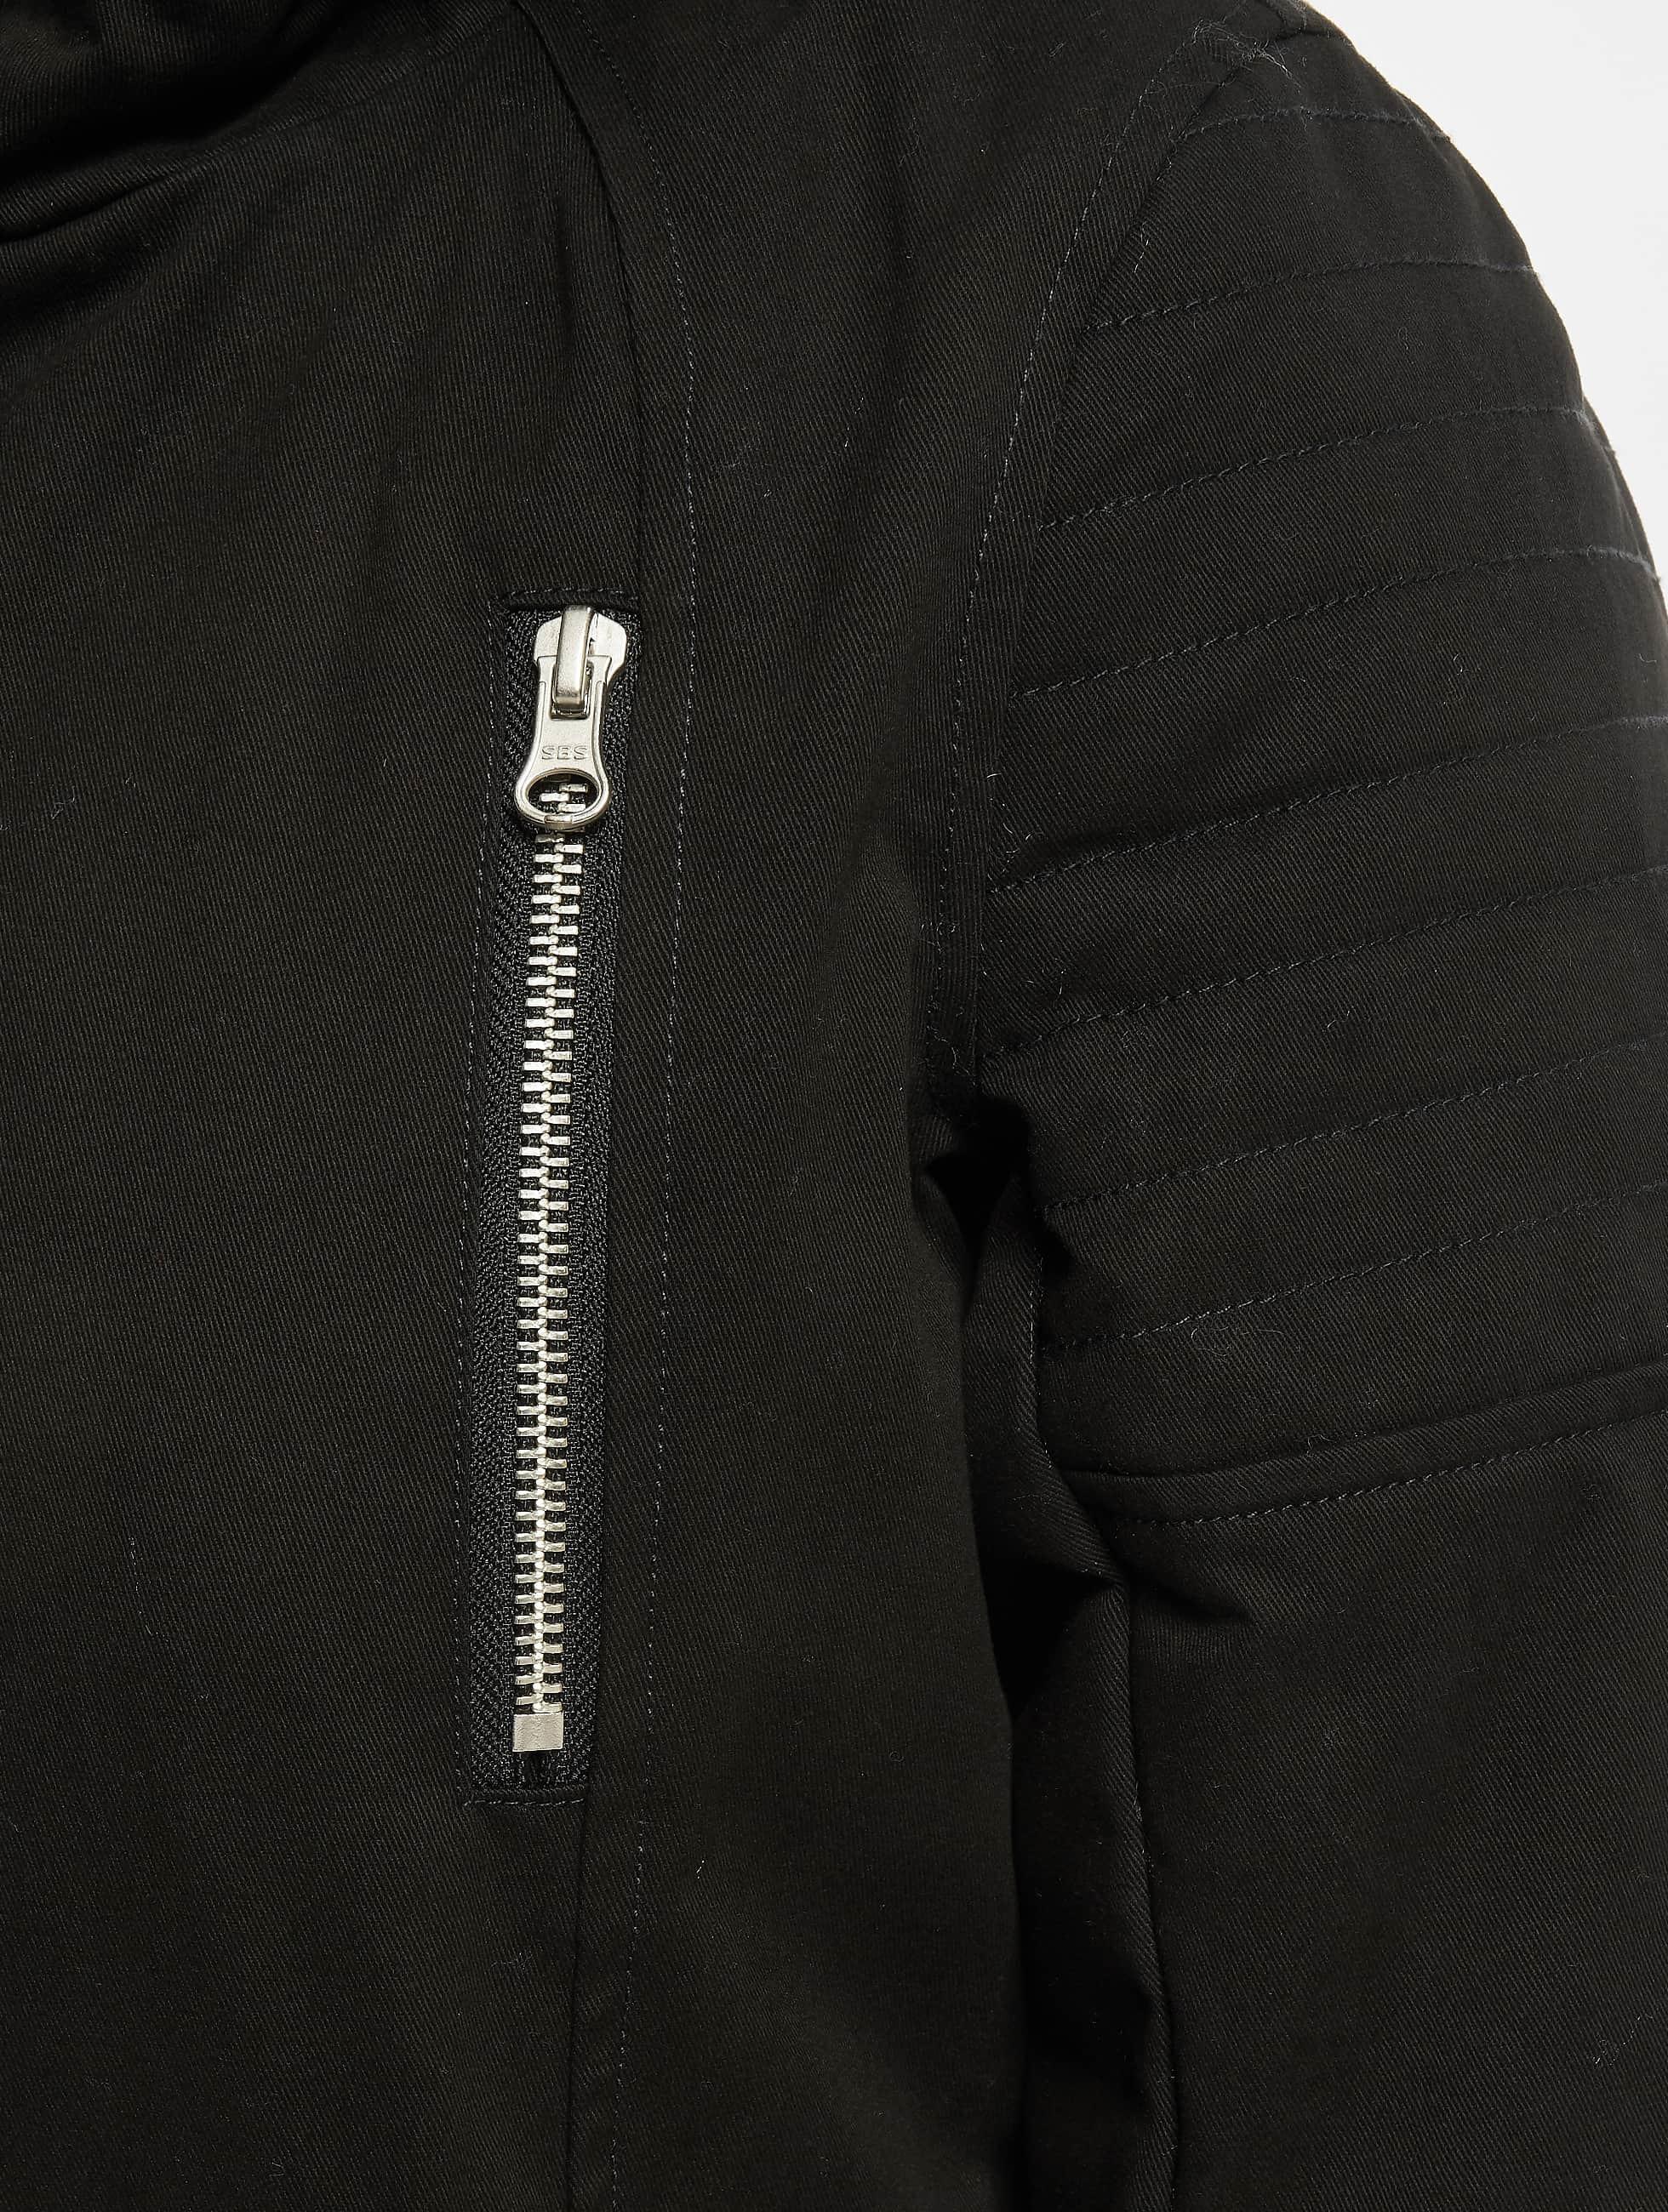 Urban Classics Kurtki zimowe Ladies Sherpa Lined Cotton czarny